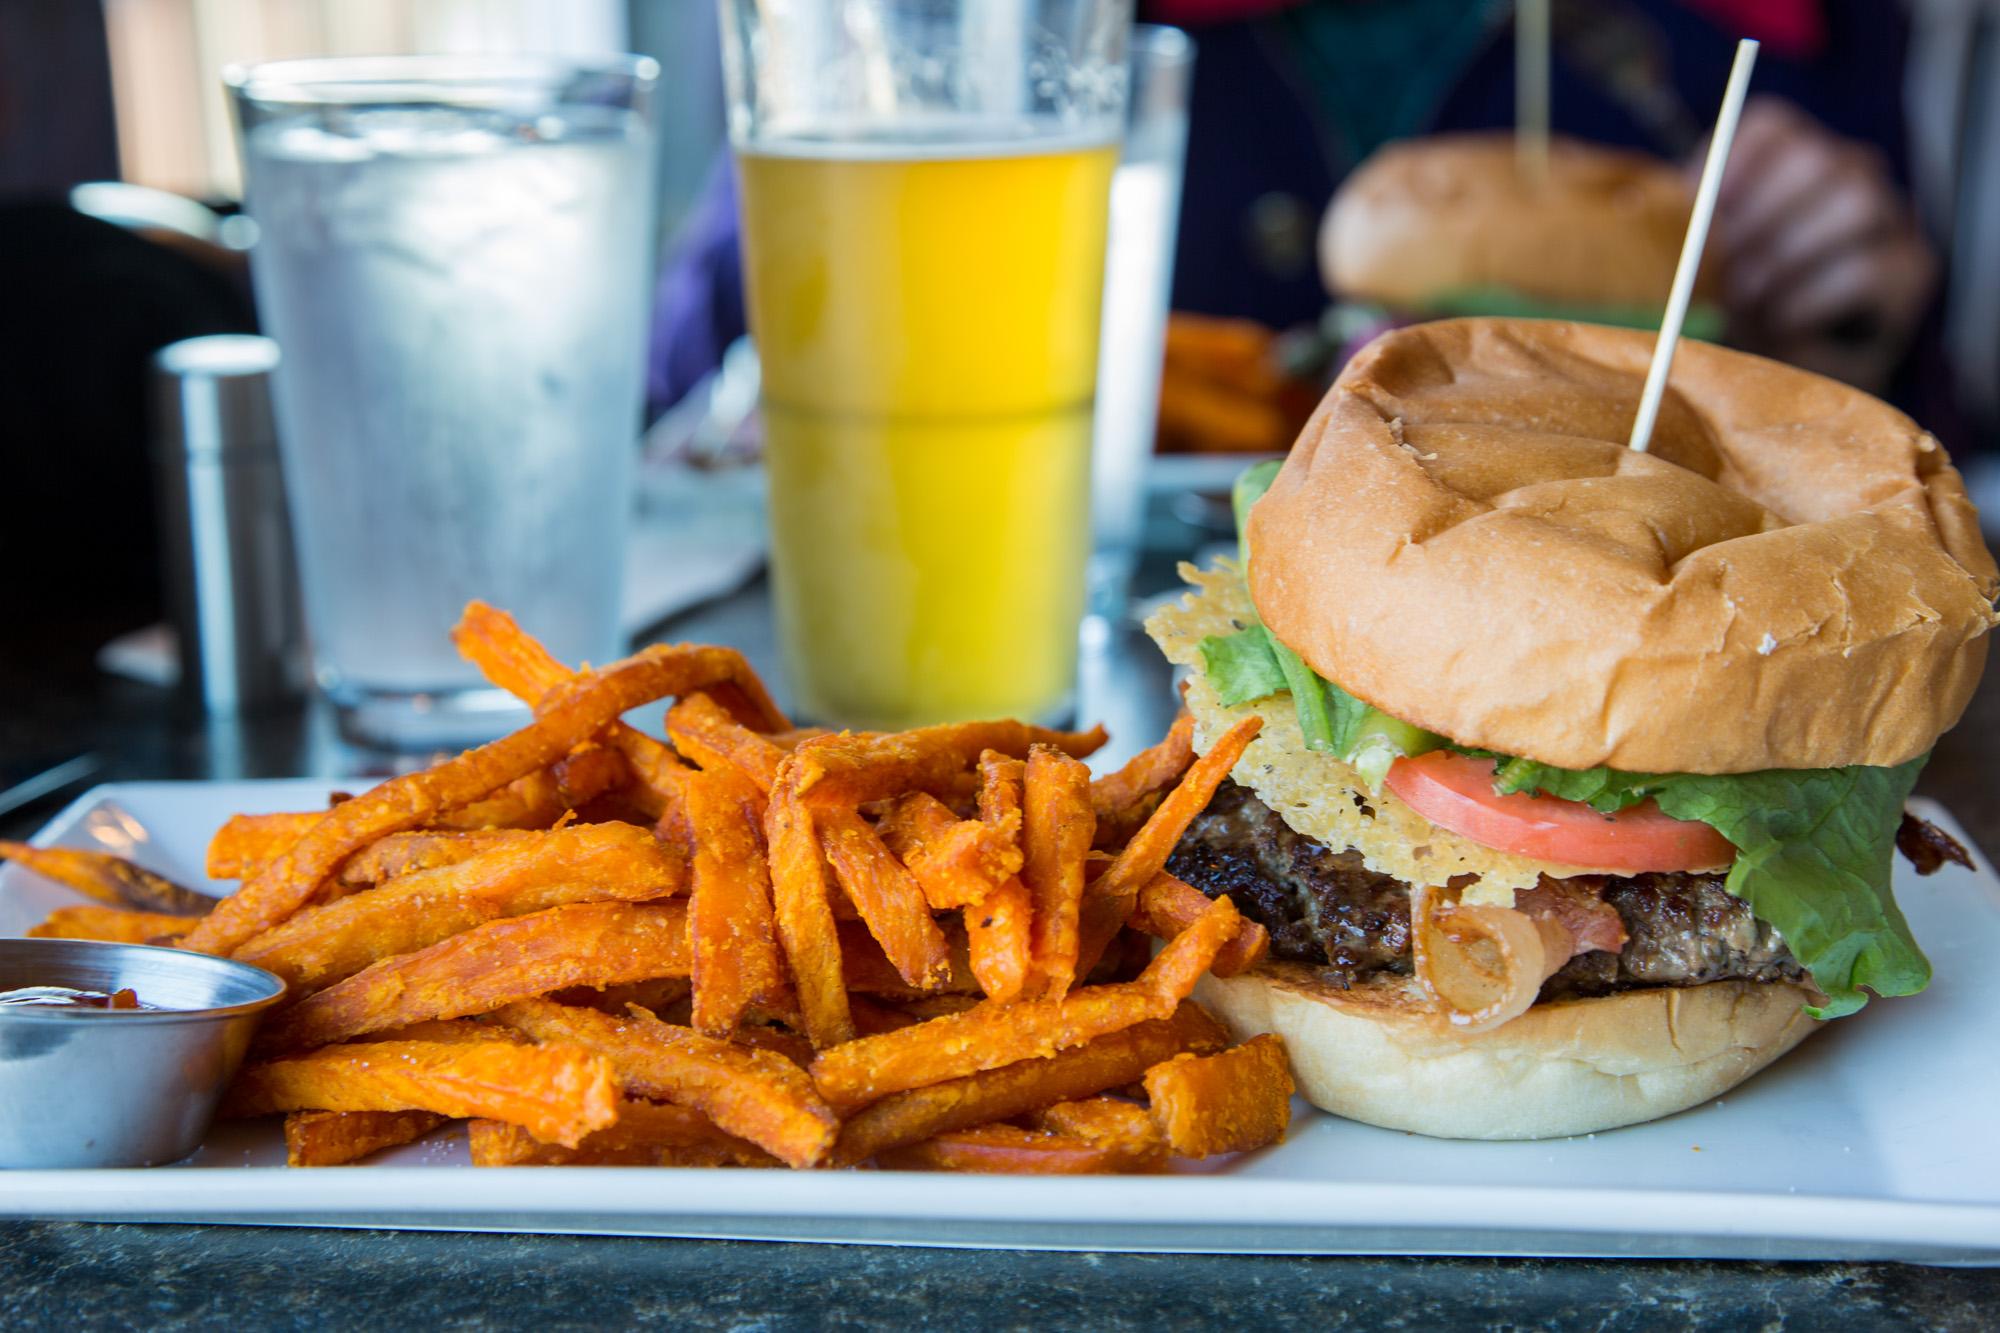 Hamburger and Sweet Potato Fries, Seaward, Alaska, USA